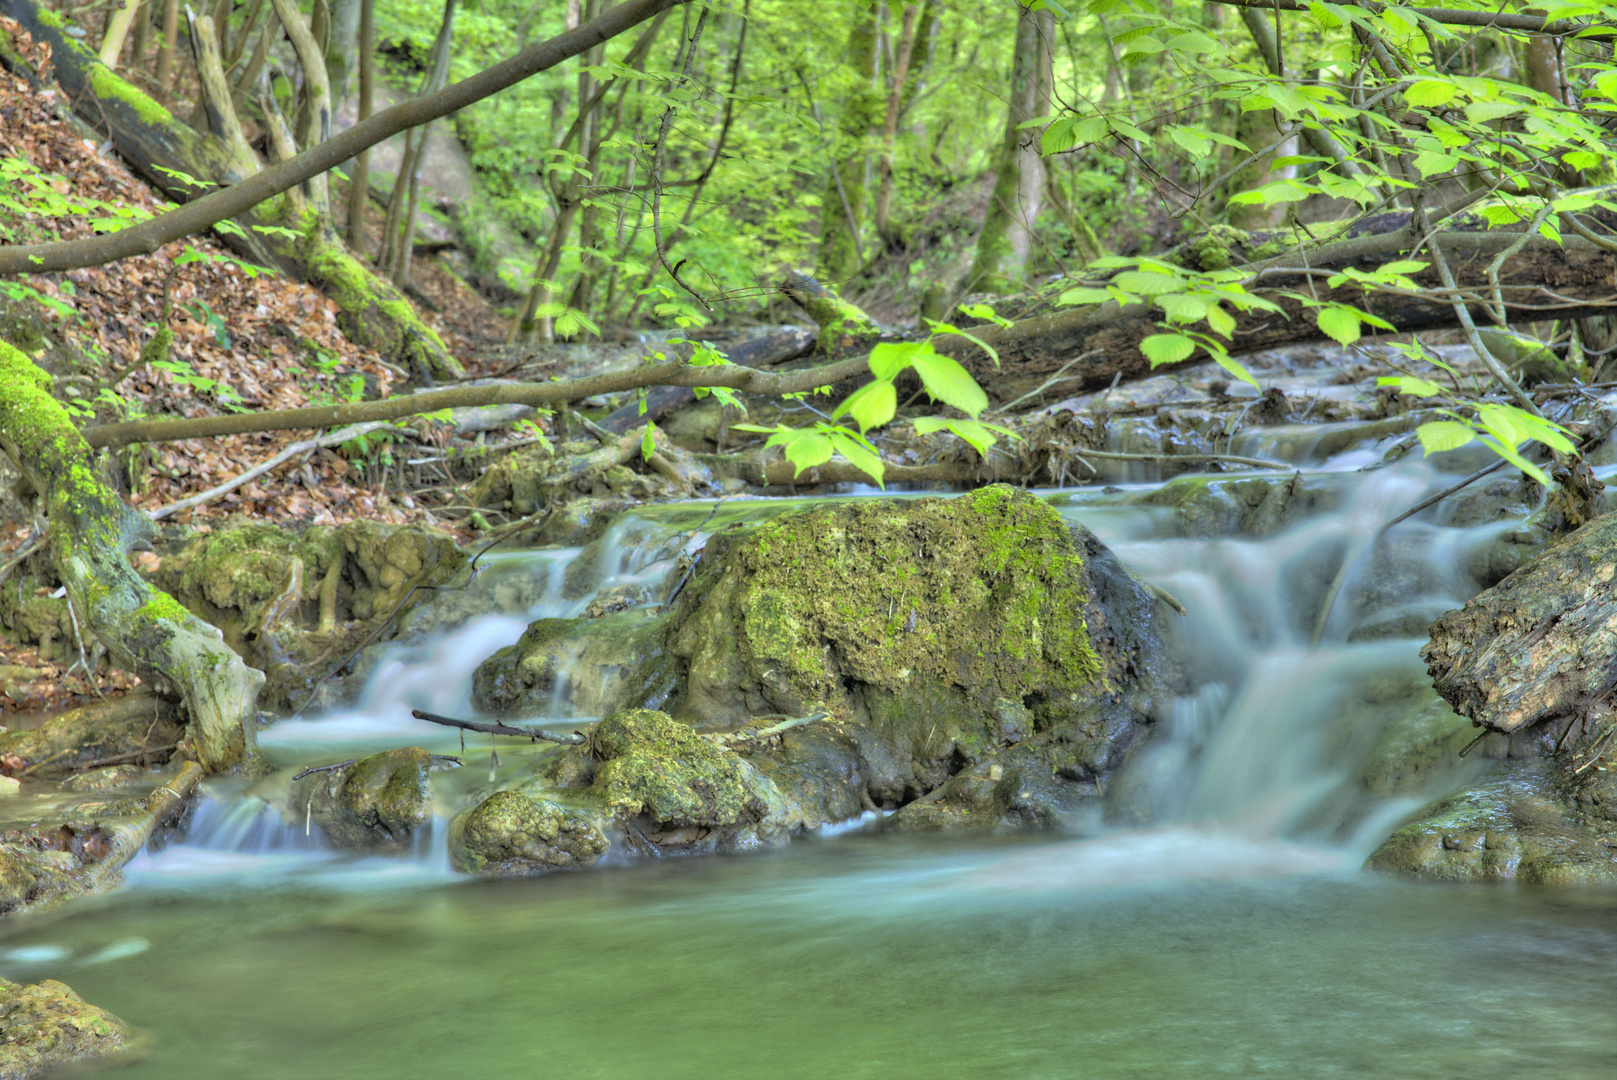 Wasserkaskaden am Wasserfall Bad Urach I